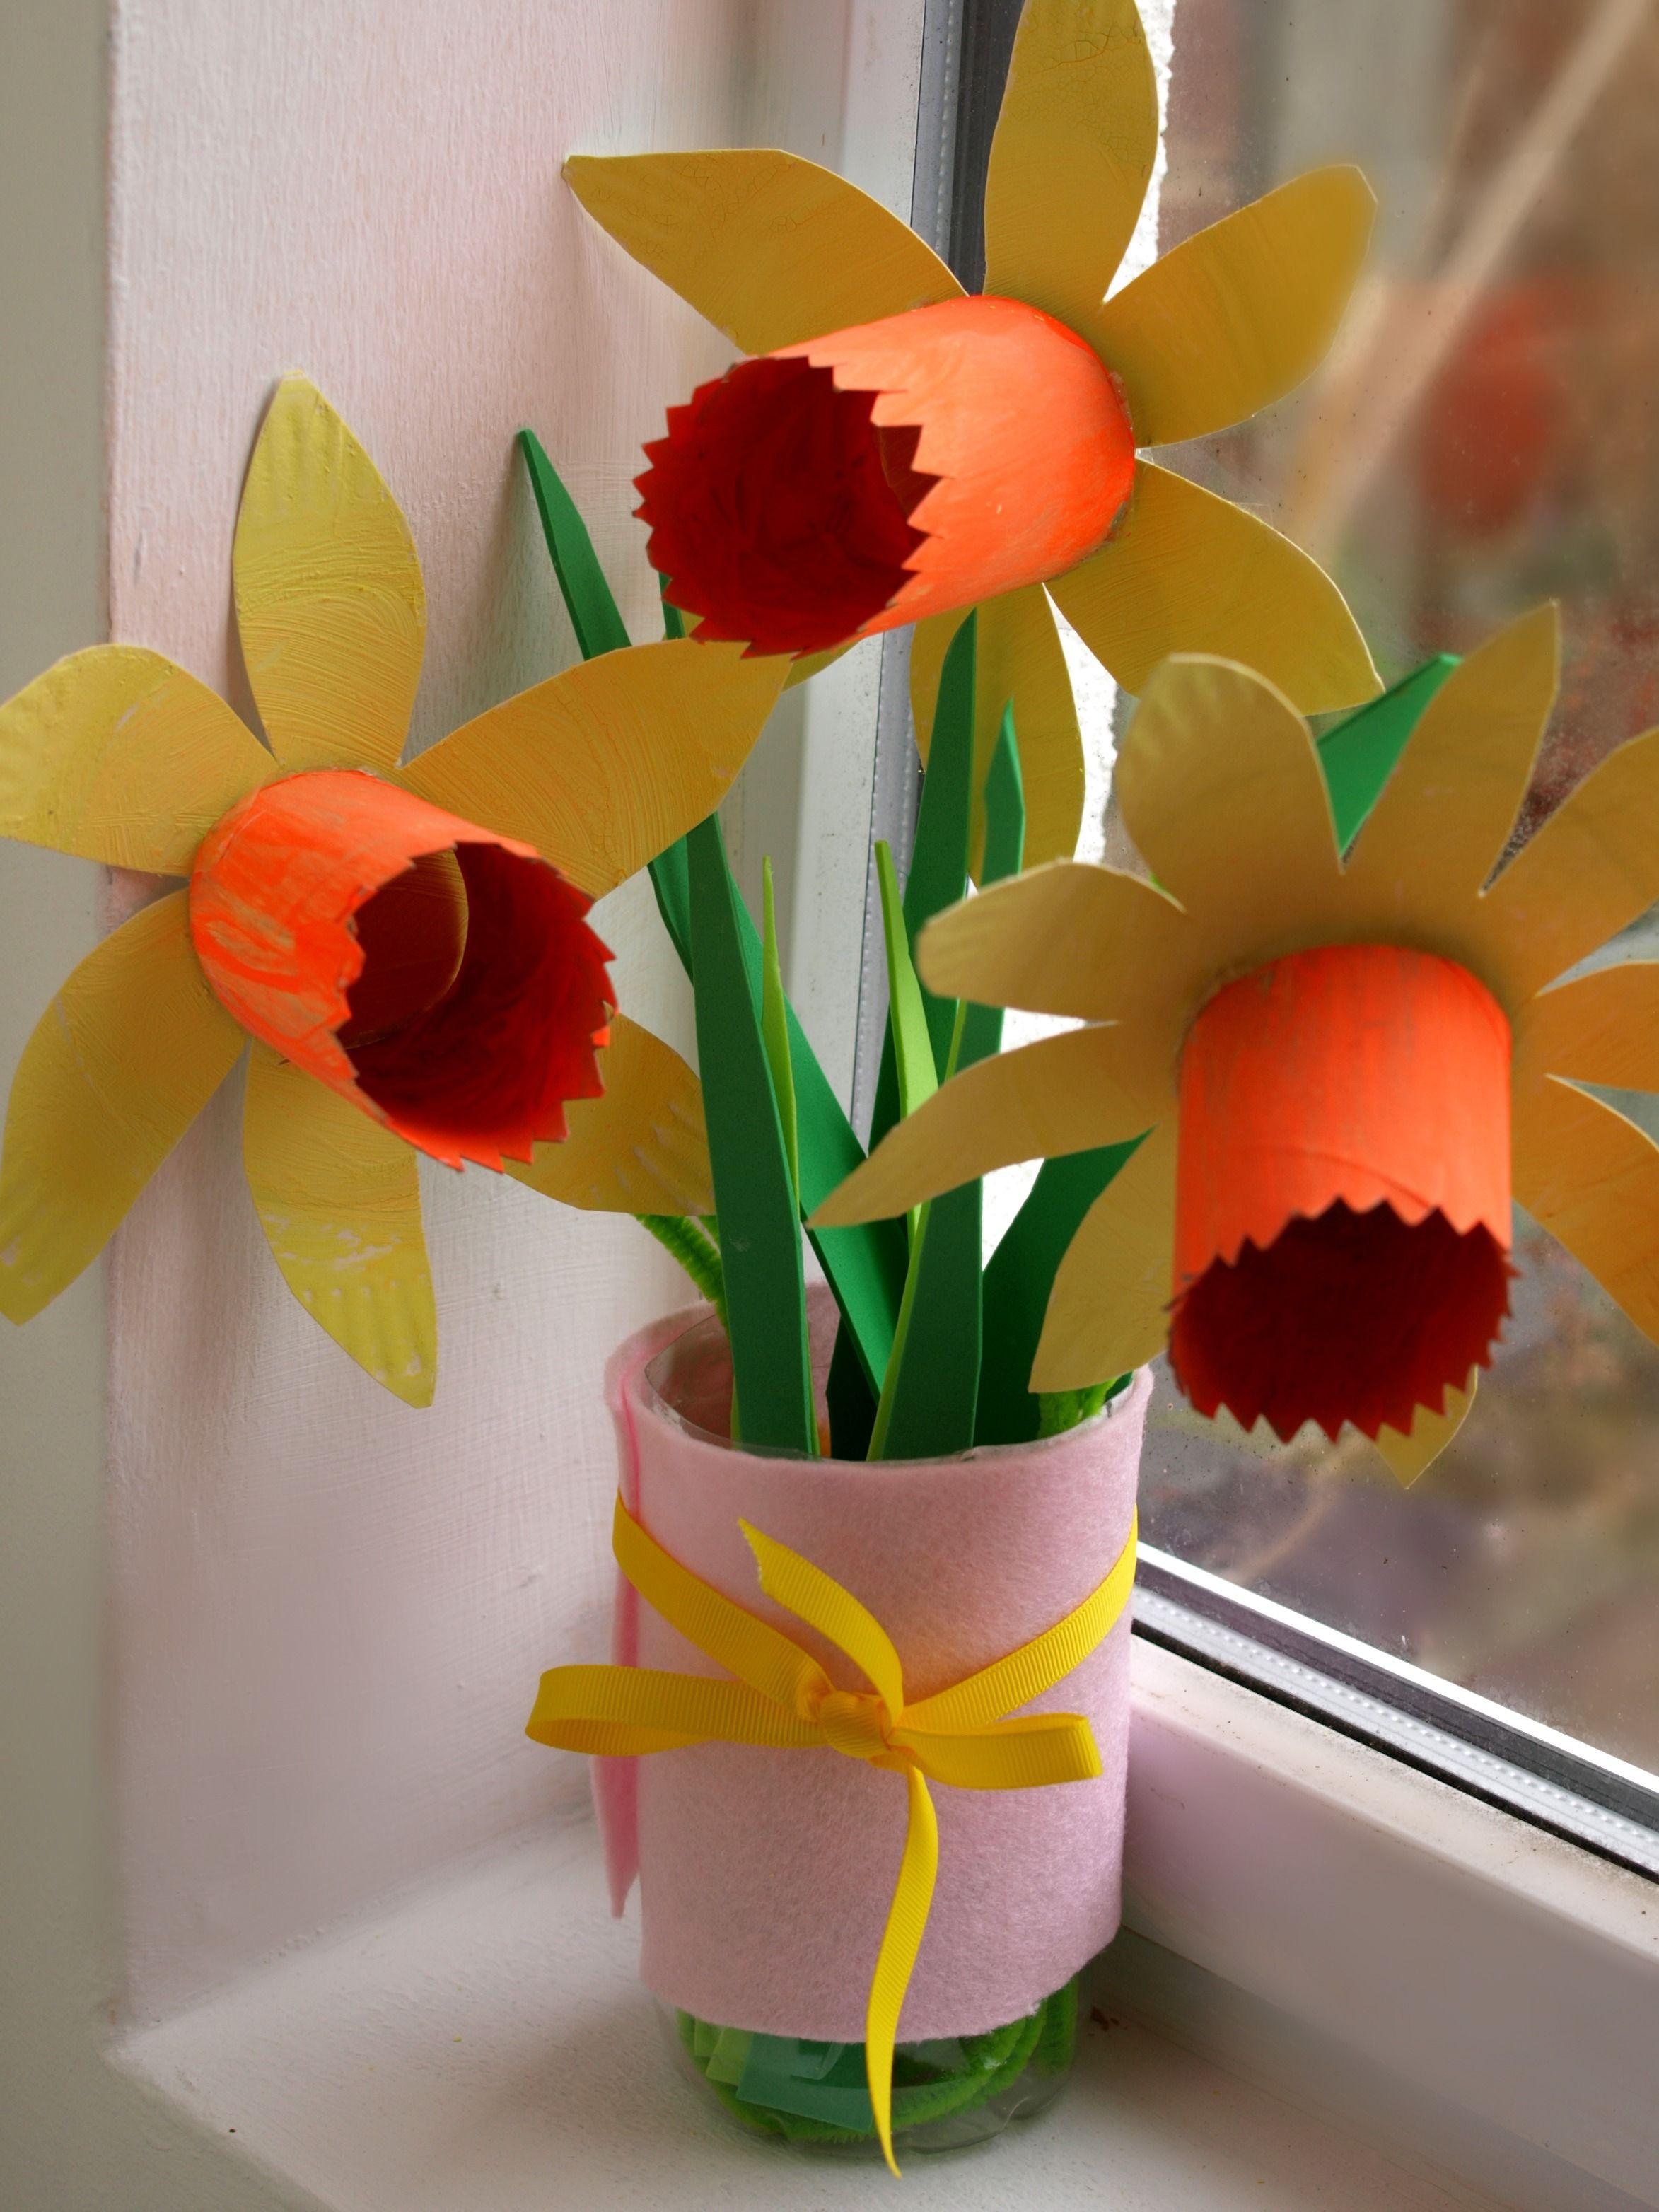 Paper plate daffodils daffodils craft and child a fun and colourful paper plate daffodil craft for kids to make jeuxipadfo Images